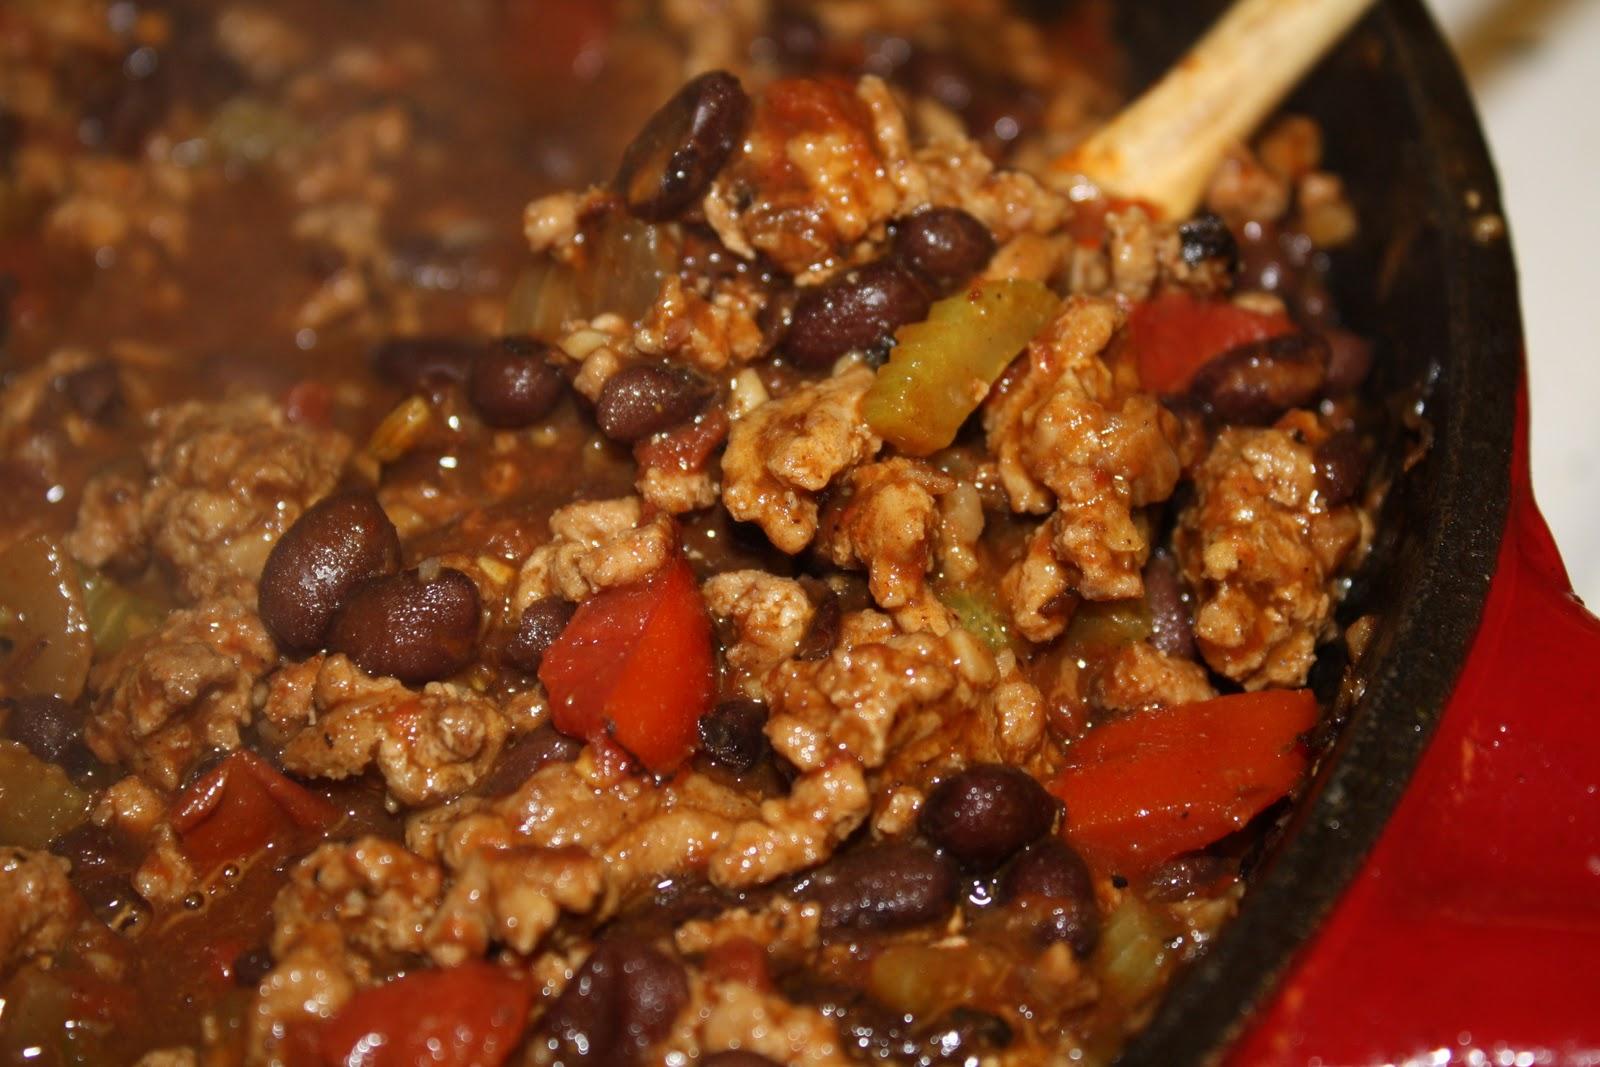 My Recipes: Turkey Chili | A Hundred Pounds Lost